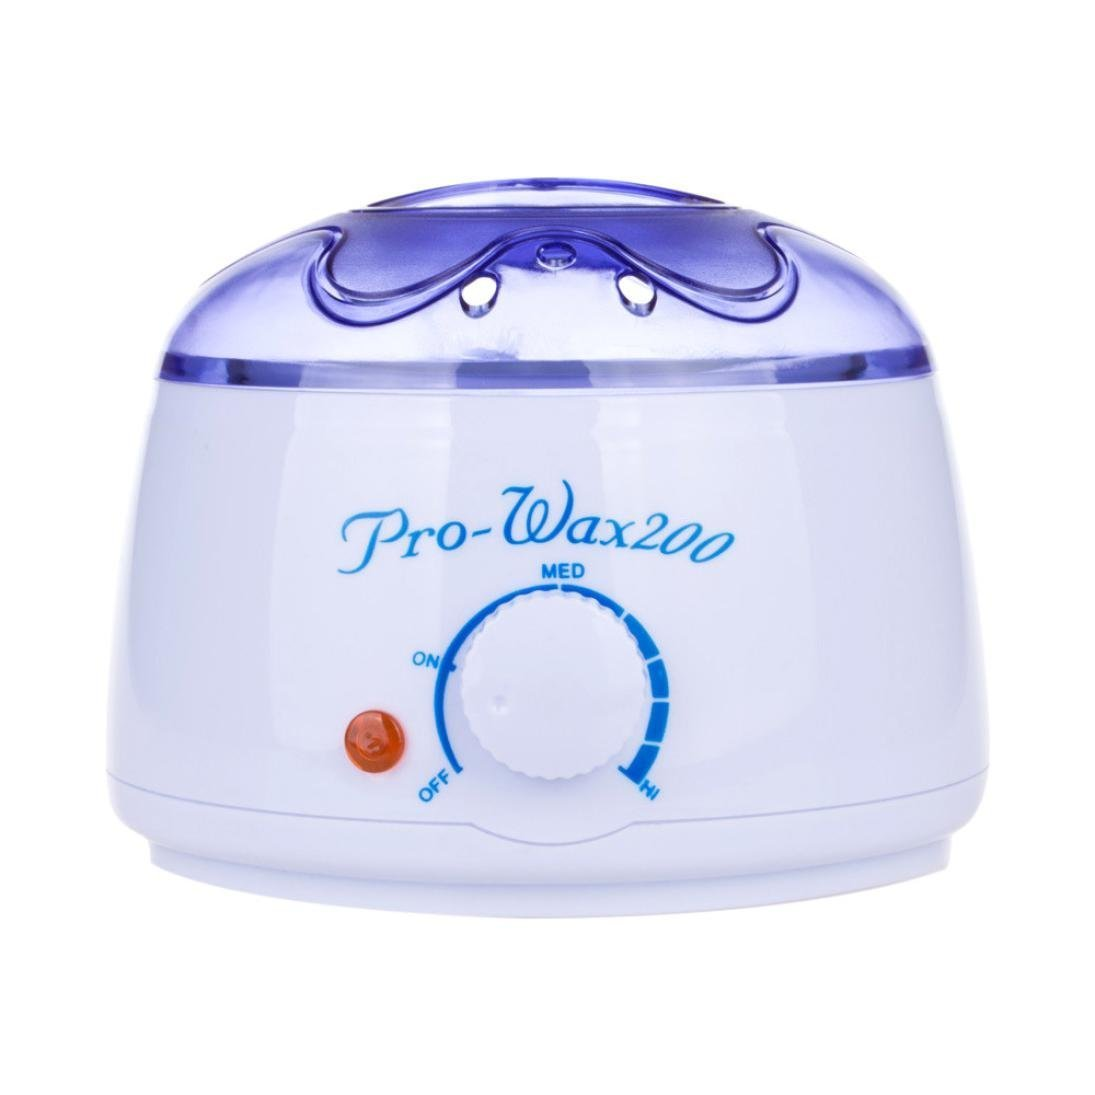 Wax Warmer Machine Kit - Electric Hair Removal Hot Wax Warmer Heater Pot Depilatory